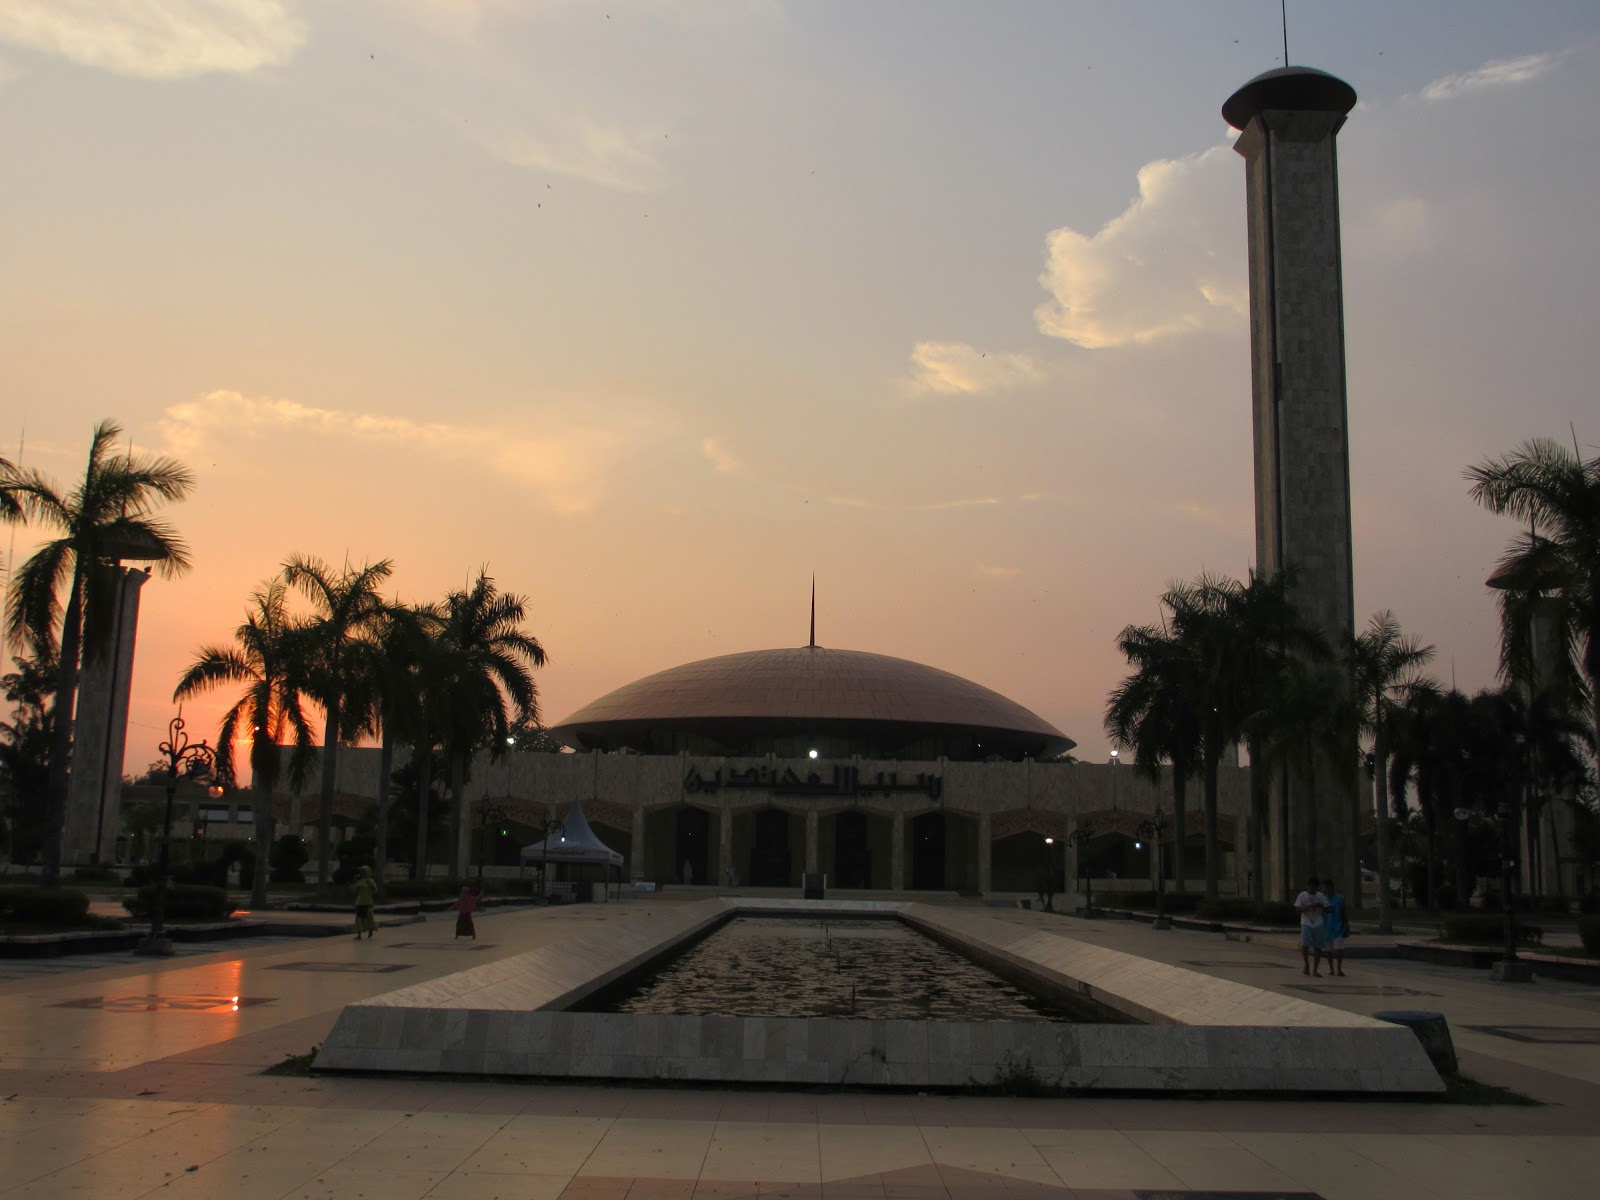 Banjarmasin Masjid Raya Sabilal Muhtadin Kab